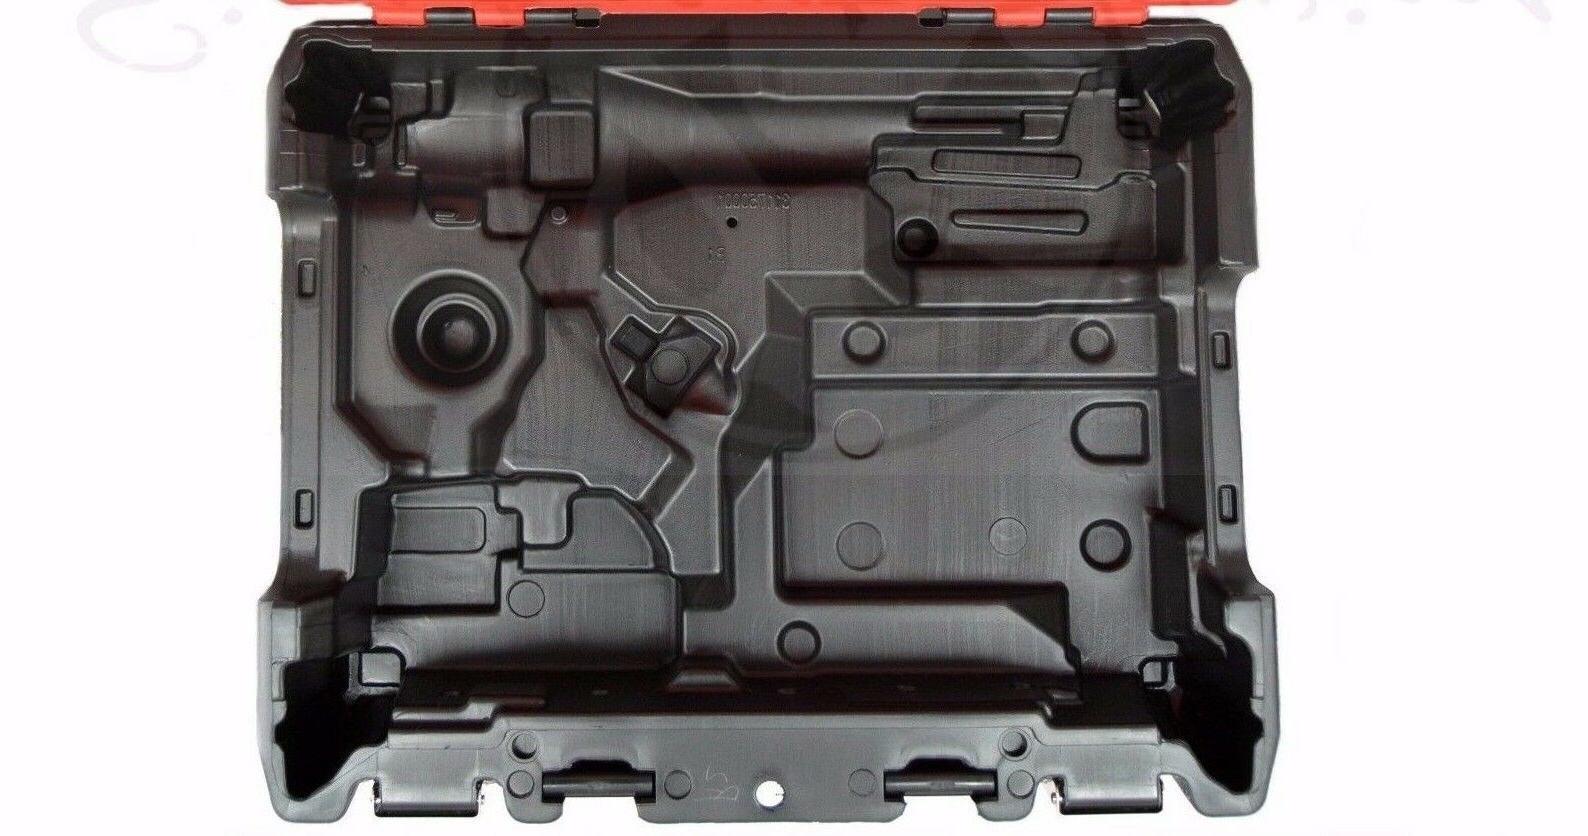 Milwaukee 18V Impact Driver Case 2753-20